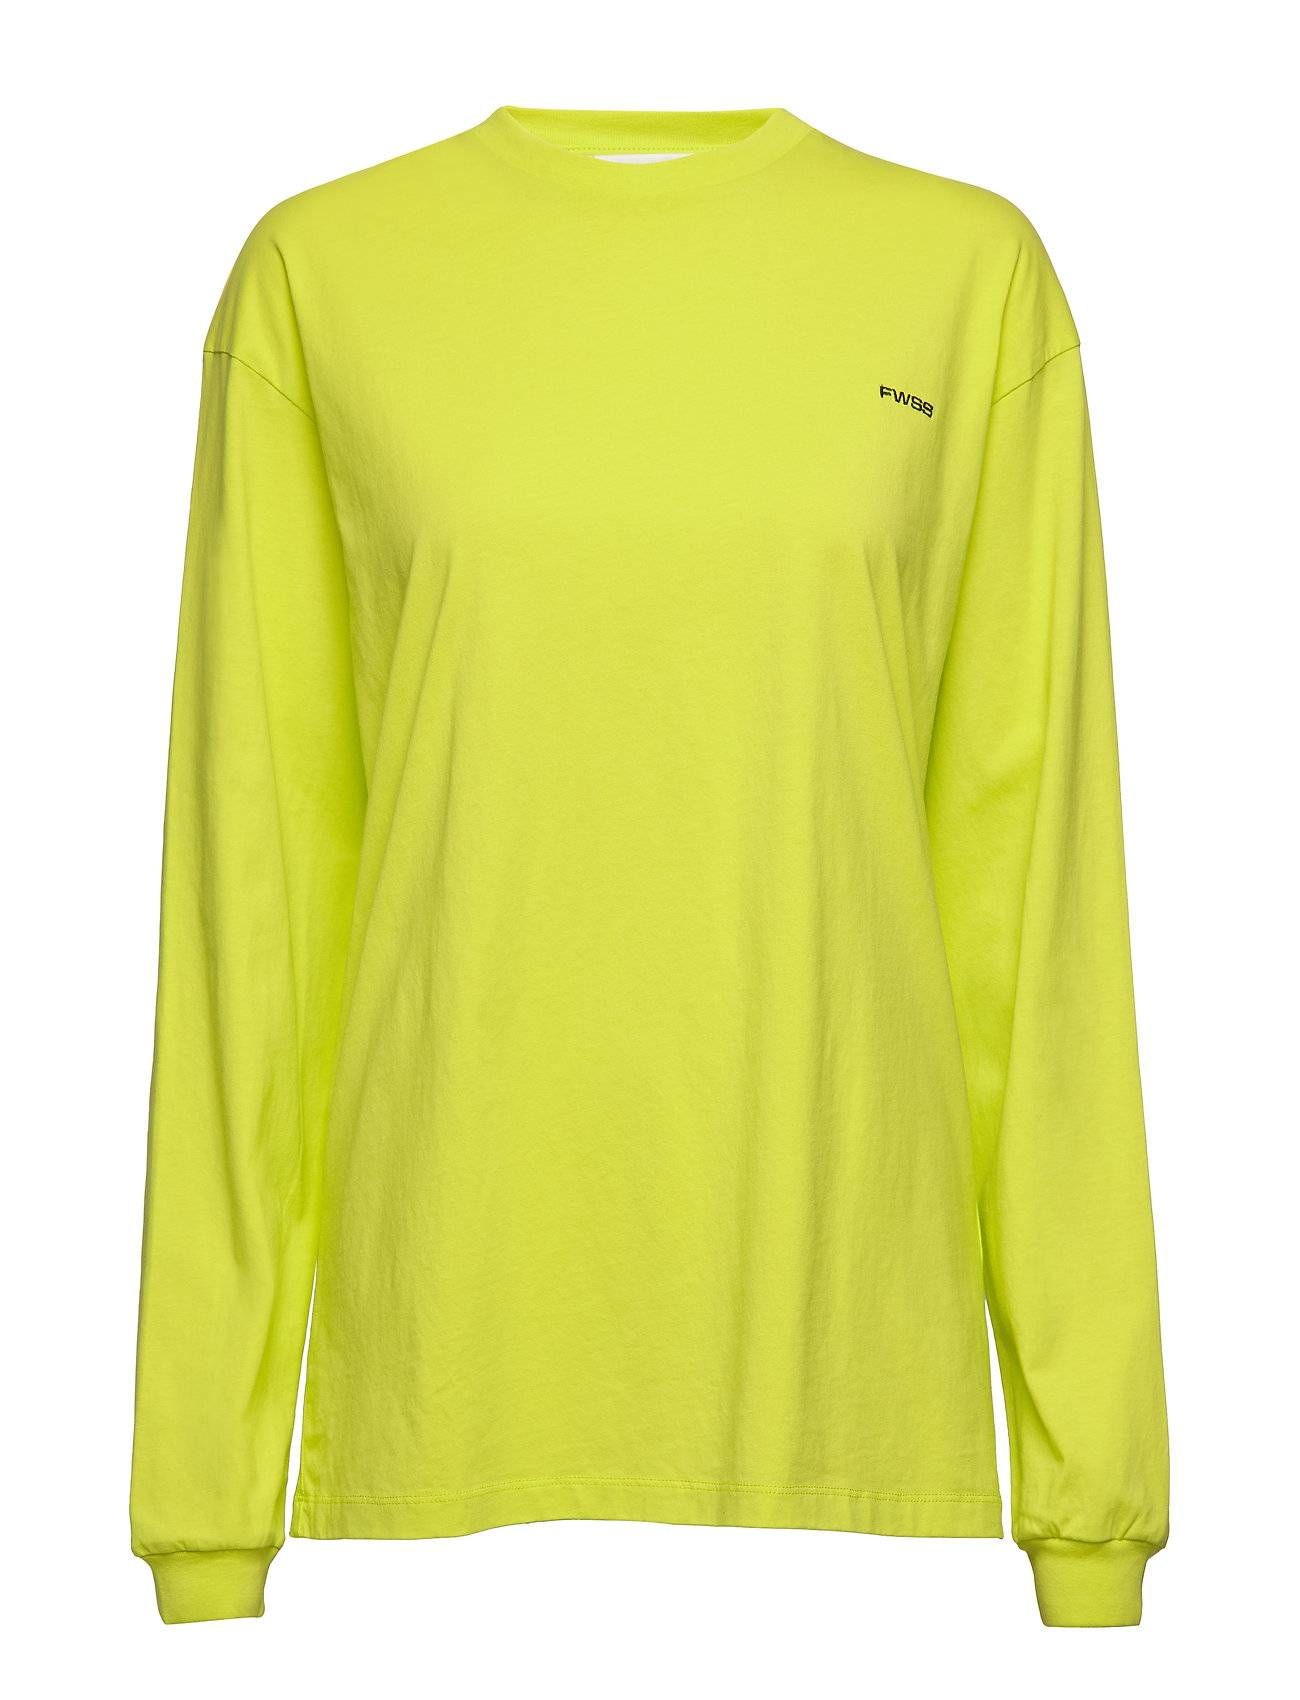 Fall Winter Spring Summer Kelly T-shirts & Tops Long-sleeved Keltainen Fall Winter Spring Summer